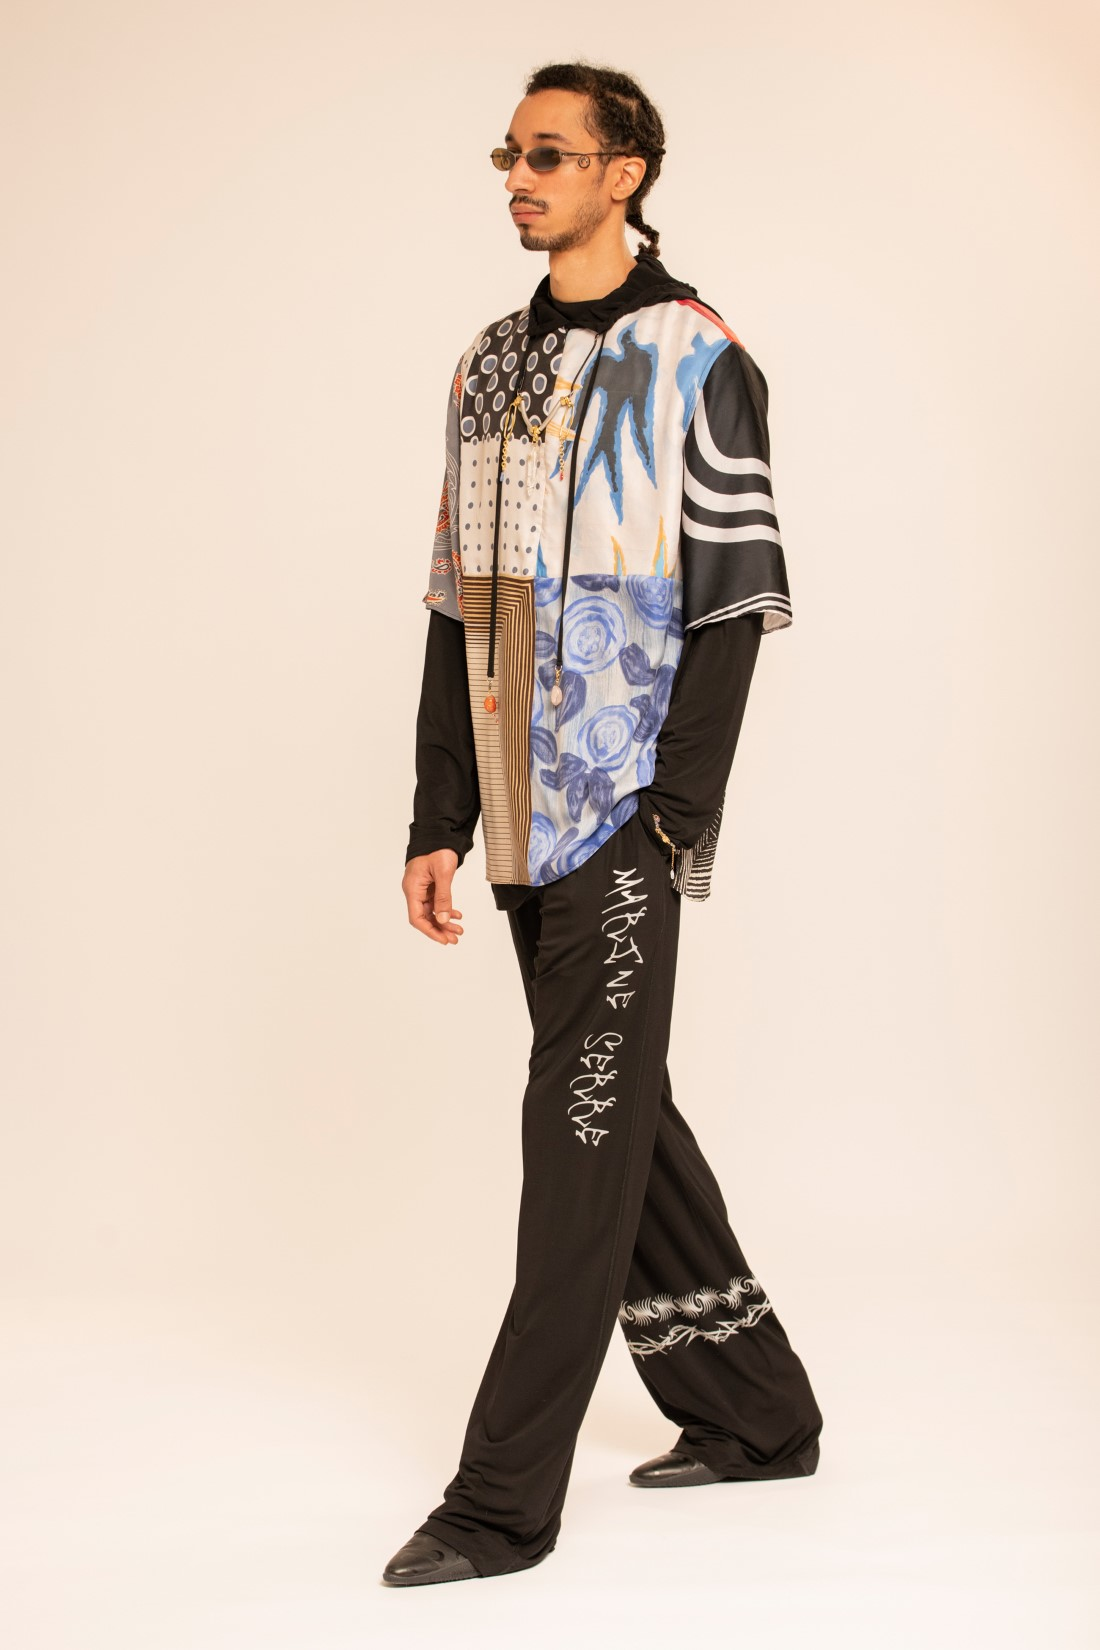 Marine Serre - Automne-Hiver 2021-2022 - Paris Fashion Week